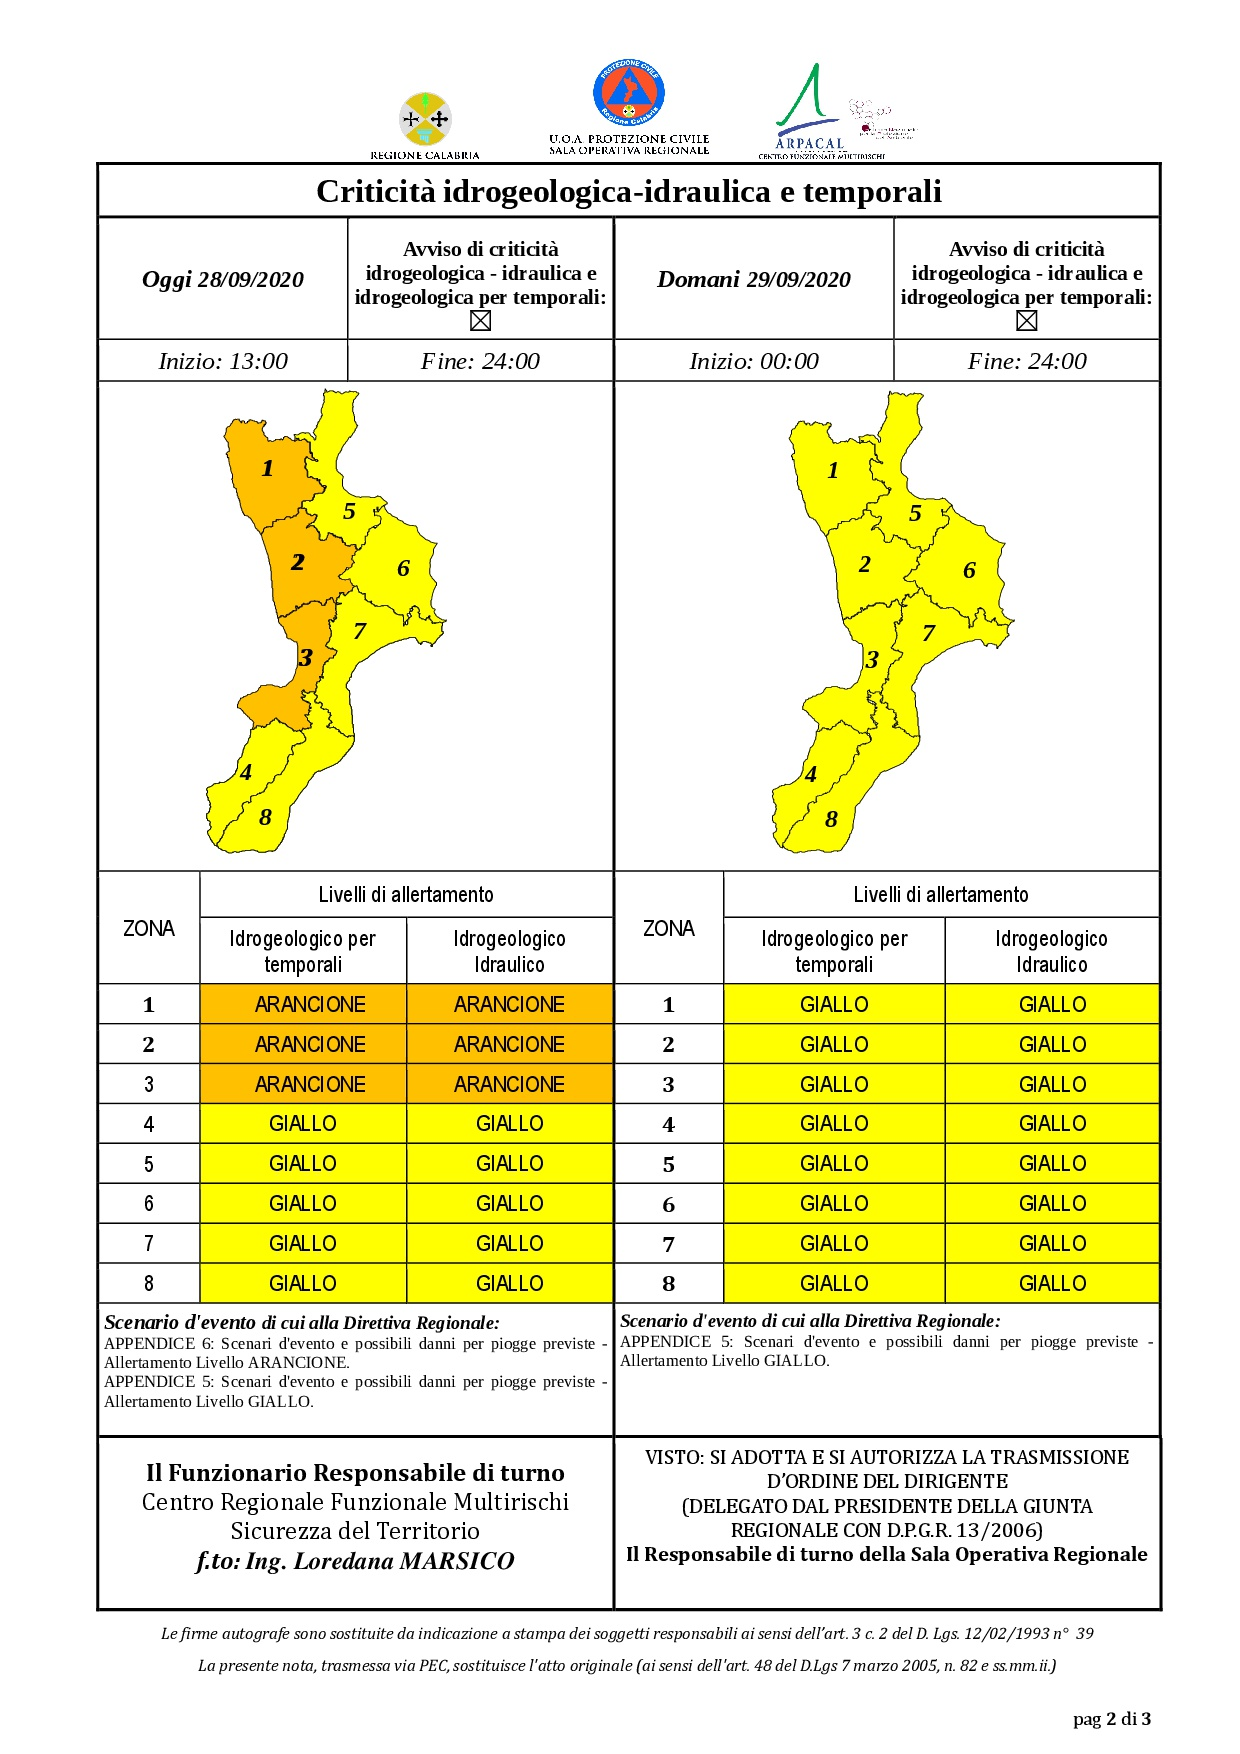 Criticità idrogeologica-idraulica e temporali in Calabria 28-09-2020